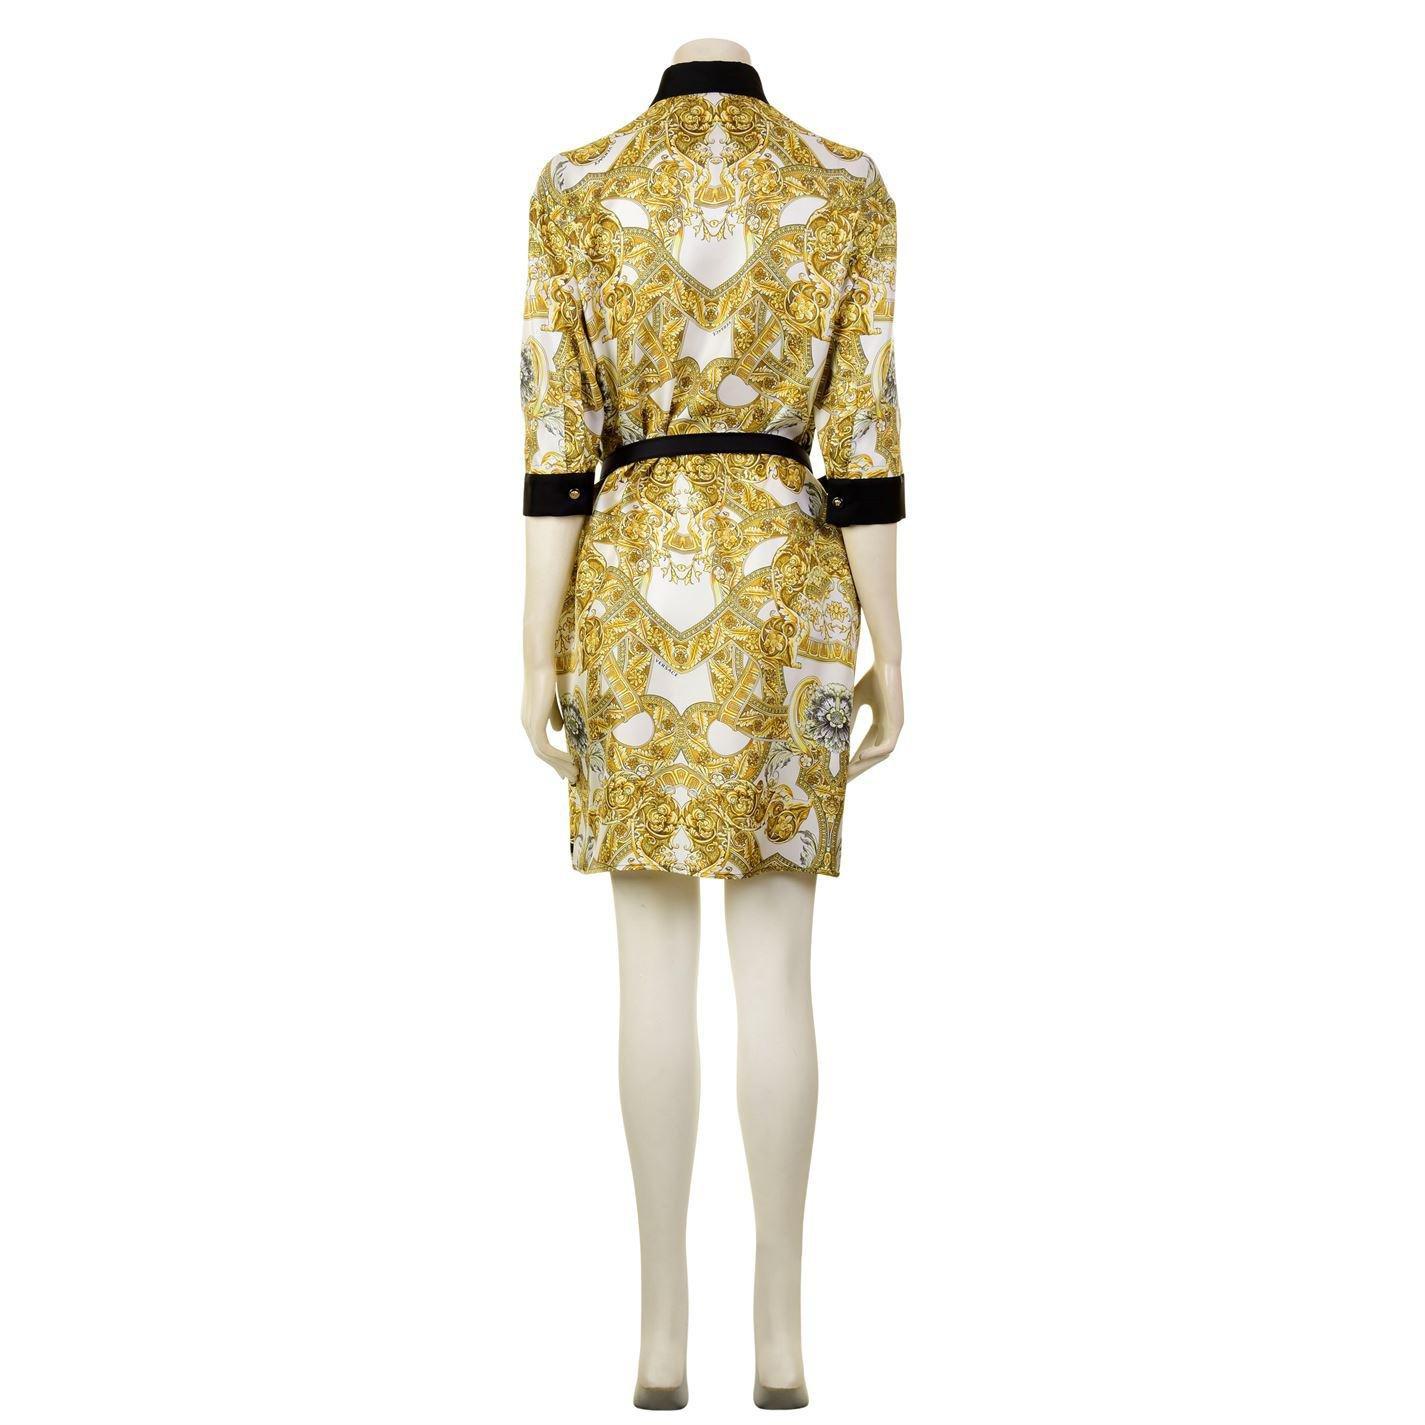 96d579520b9cbe Lyst - Versace Barocco Istante Silk Shirt Dress in Black